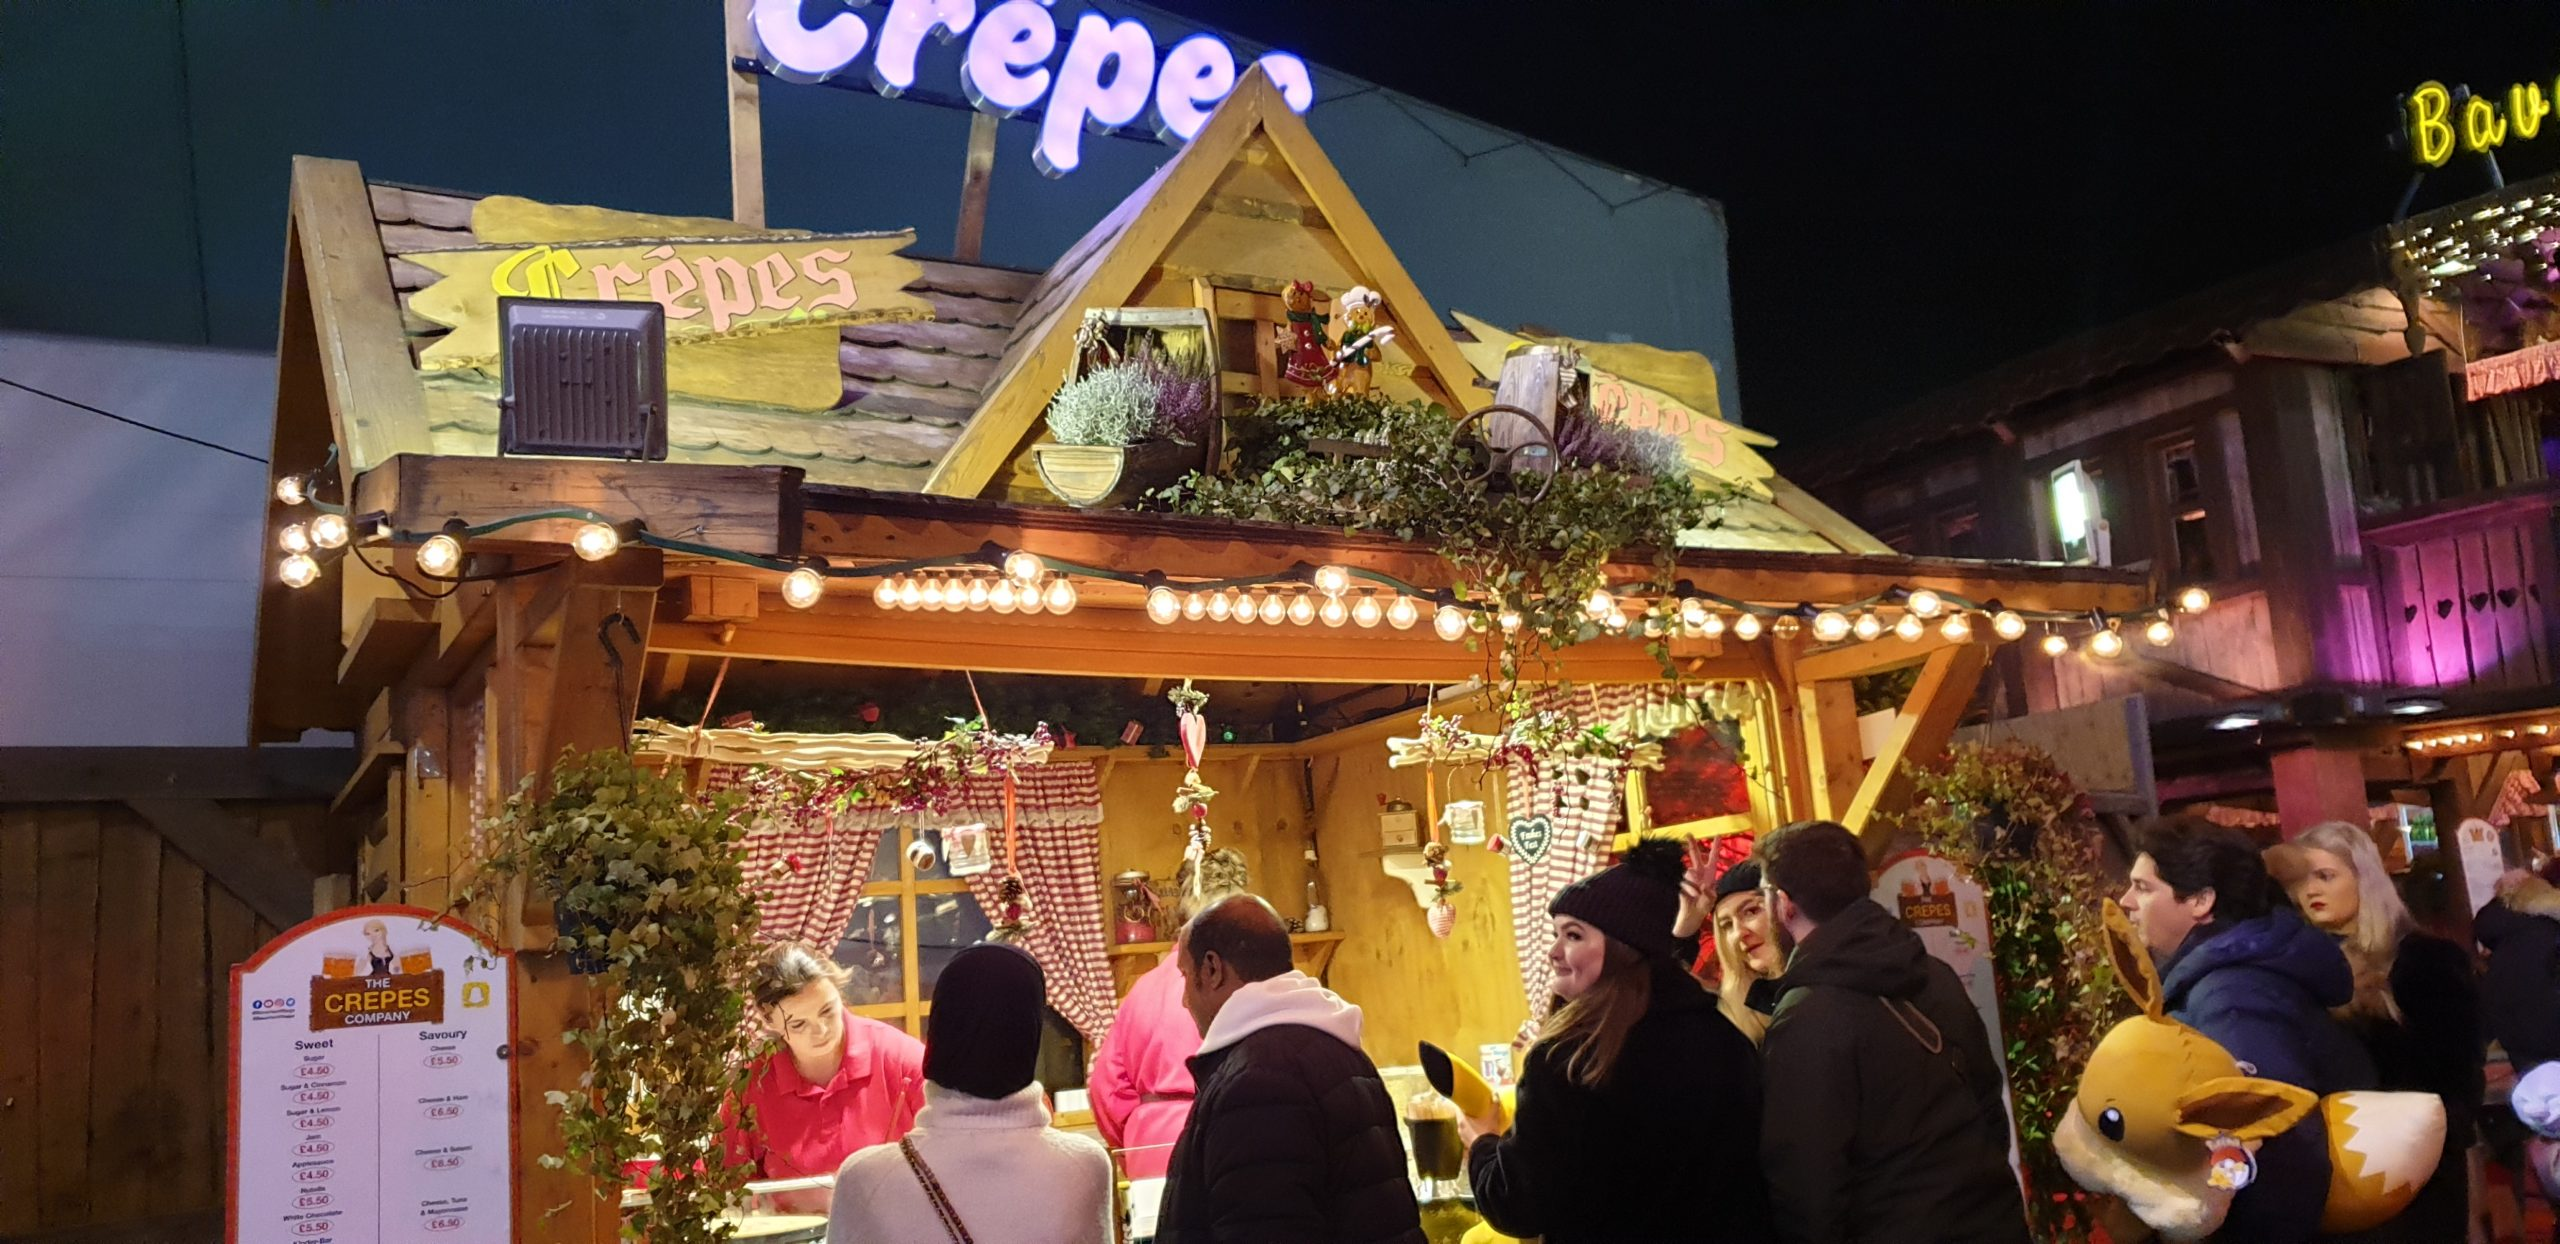 Winter Wonderland food stall in London